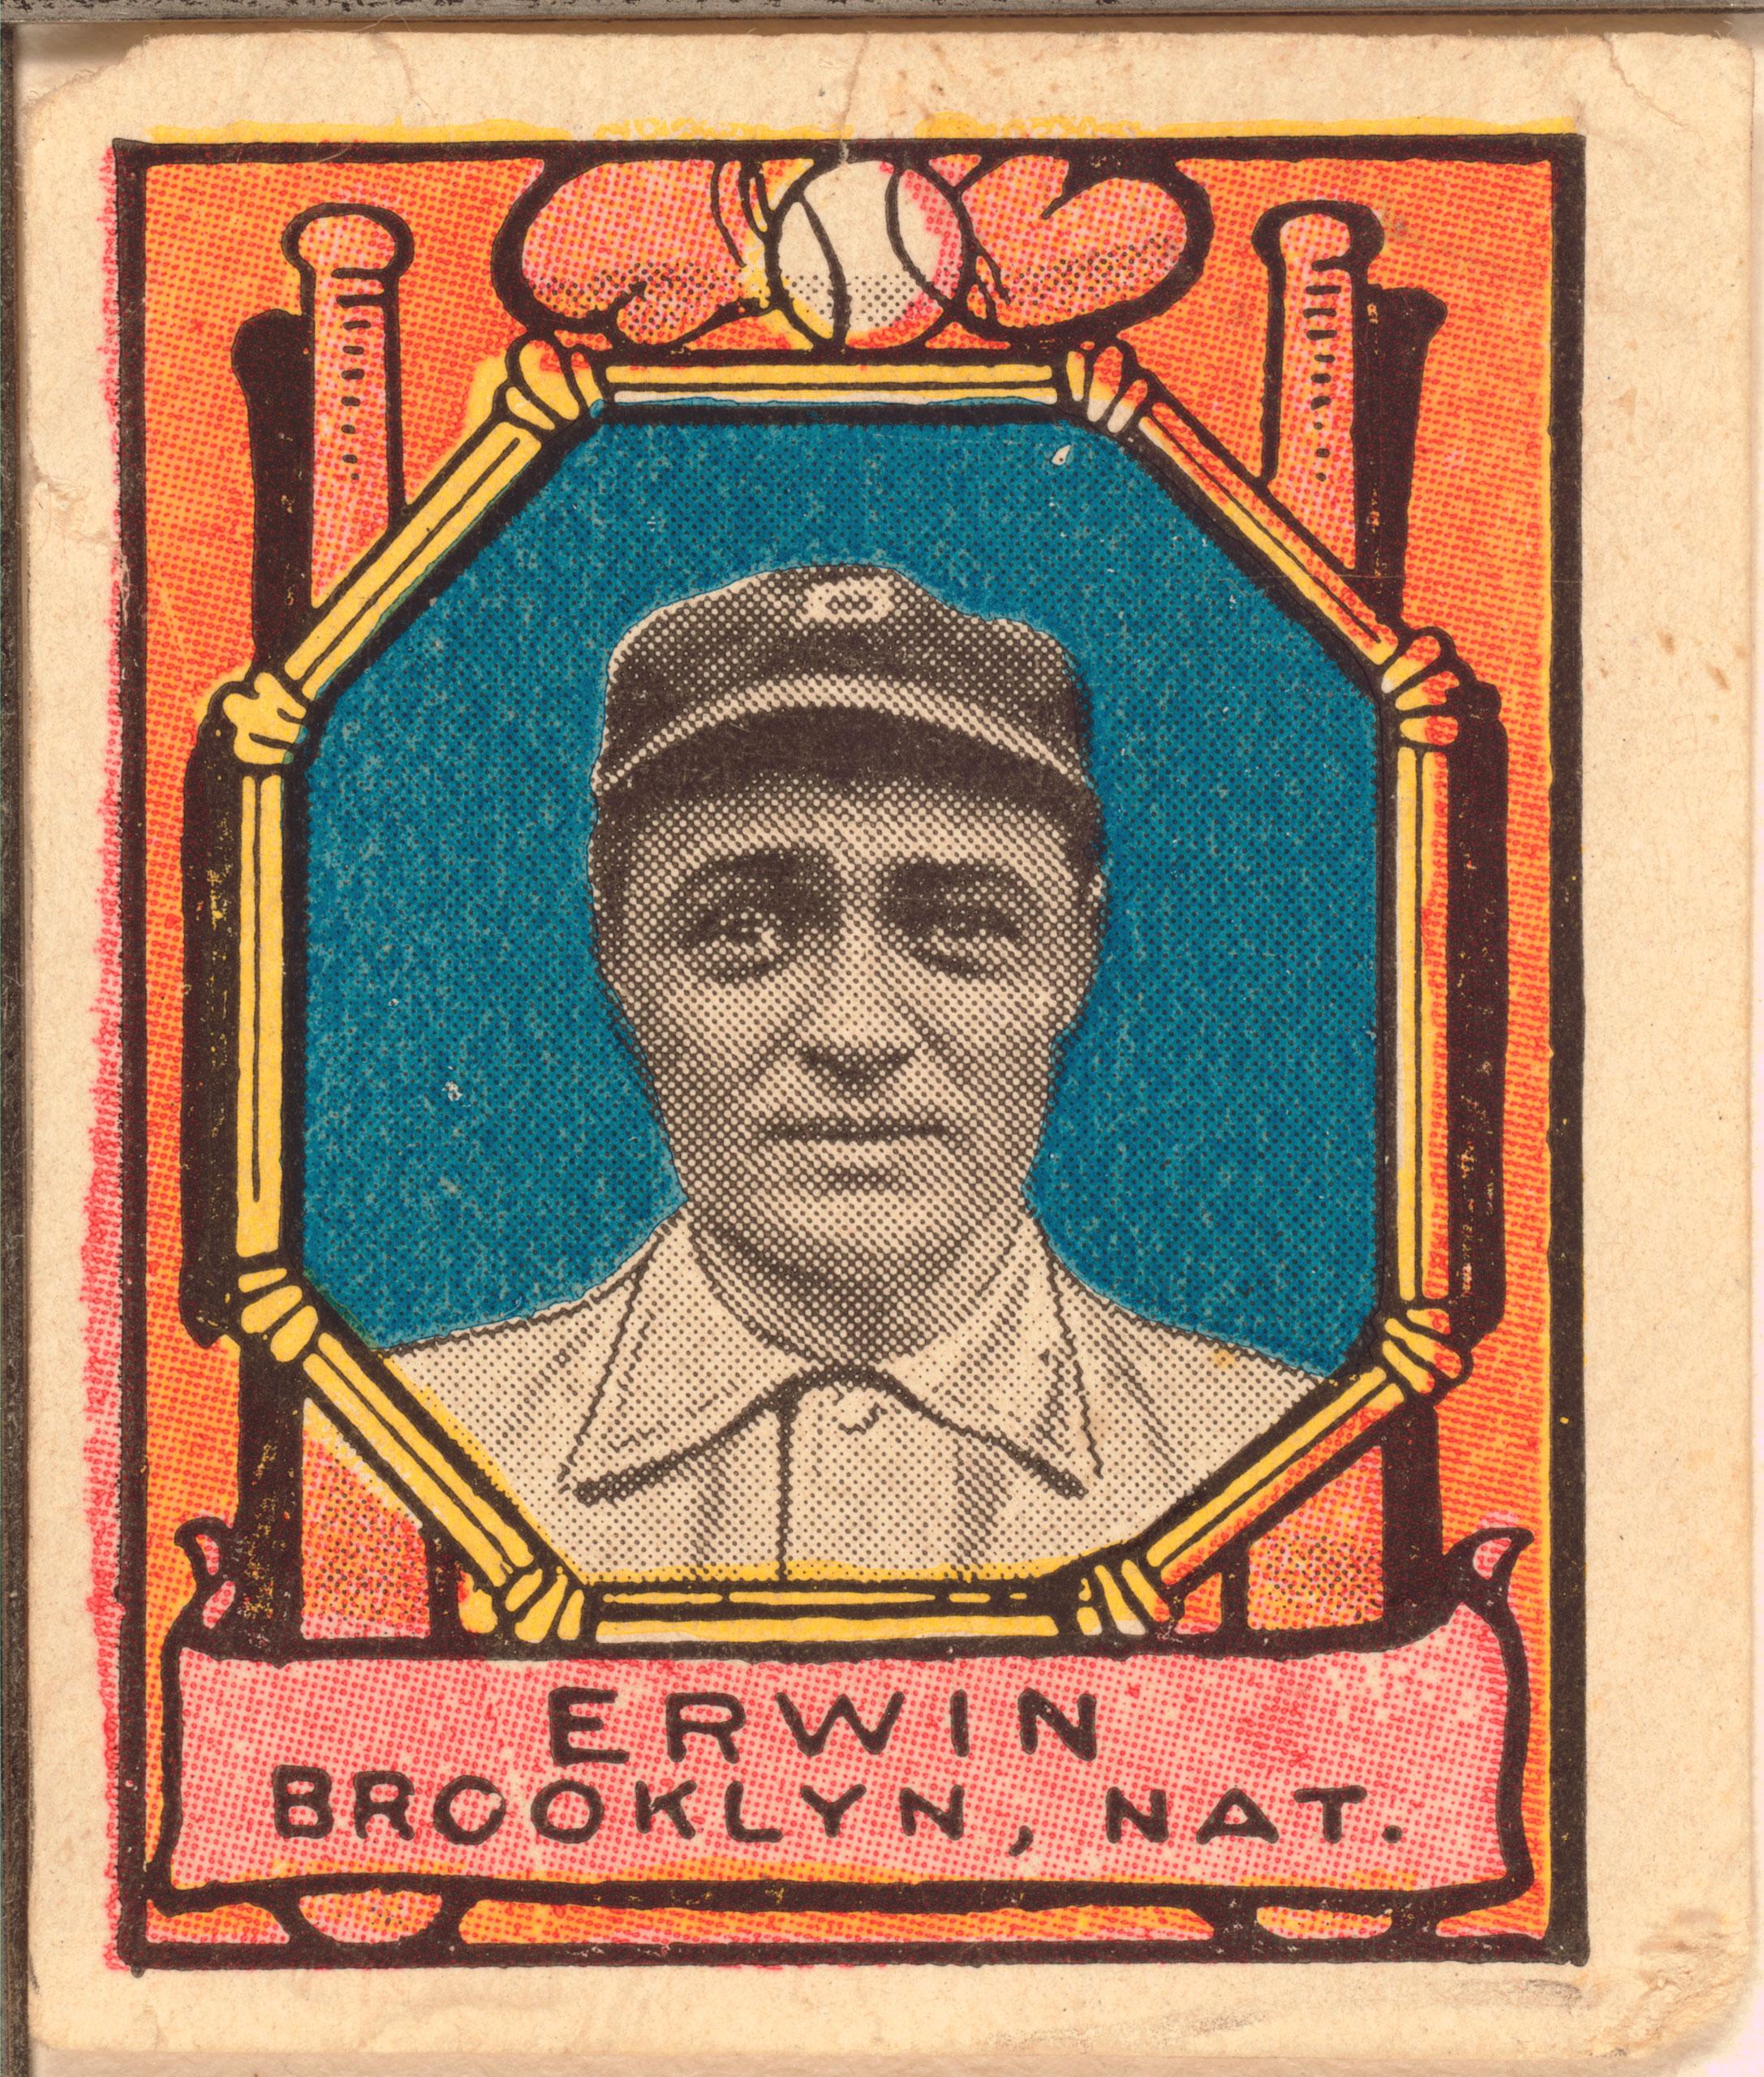 Tex Erwin, Brooklyn Dodgers, baseball card, 1911.